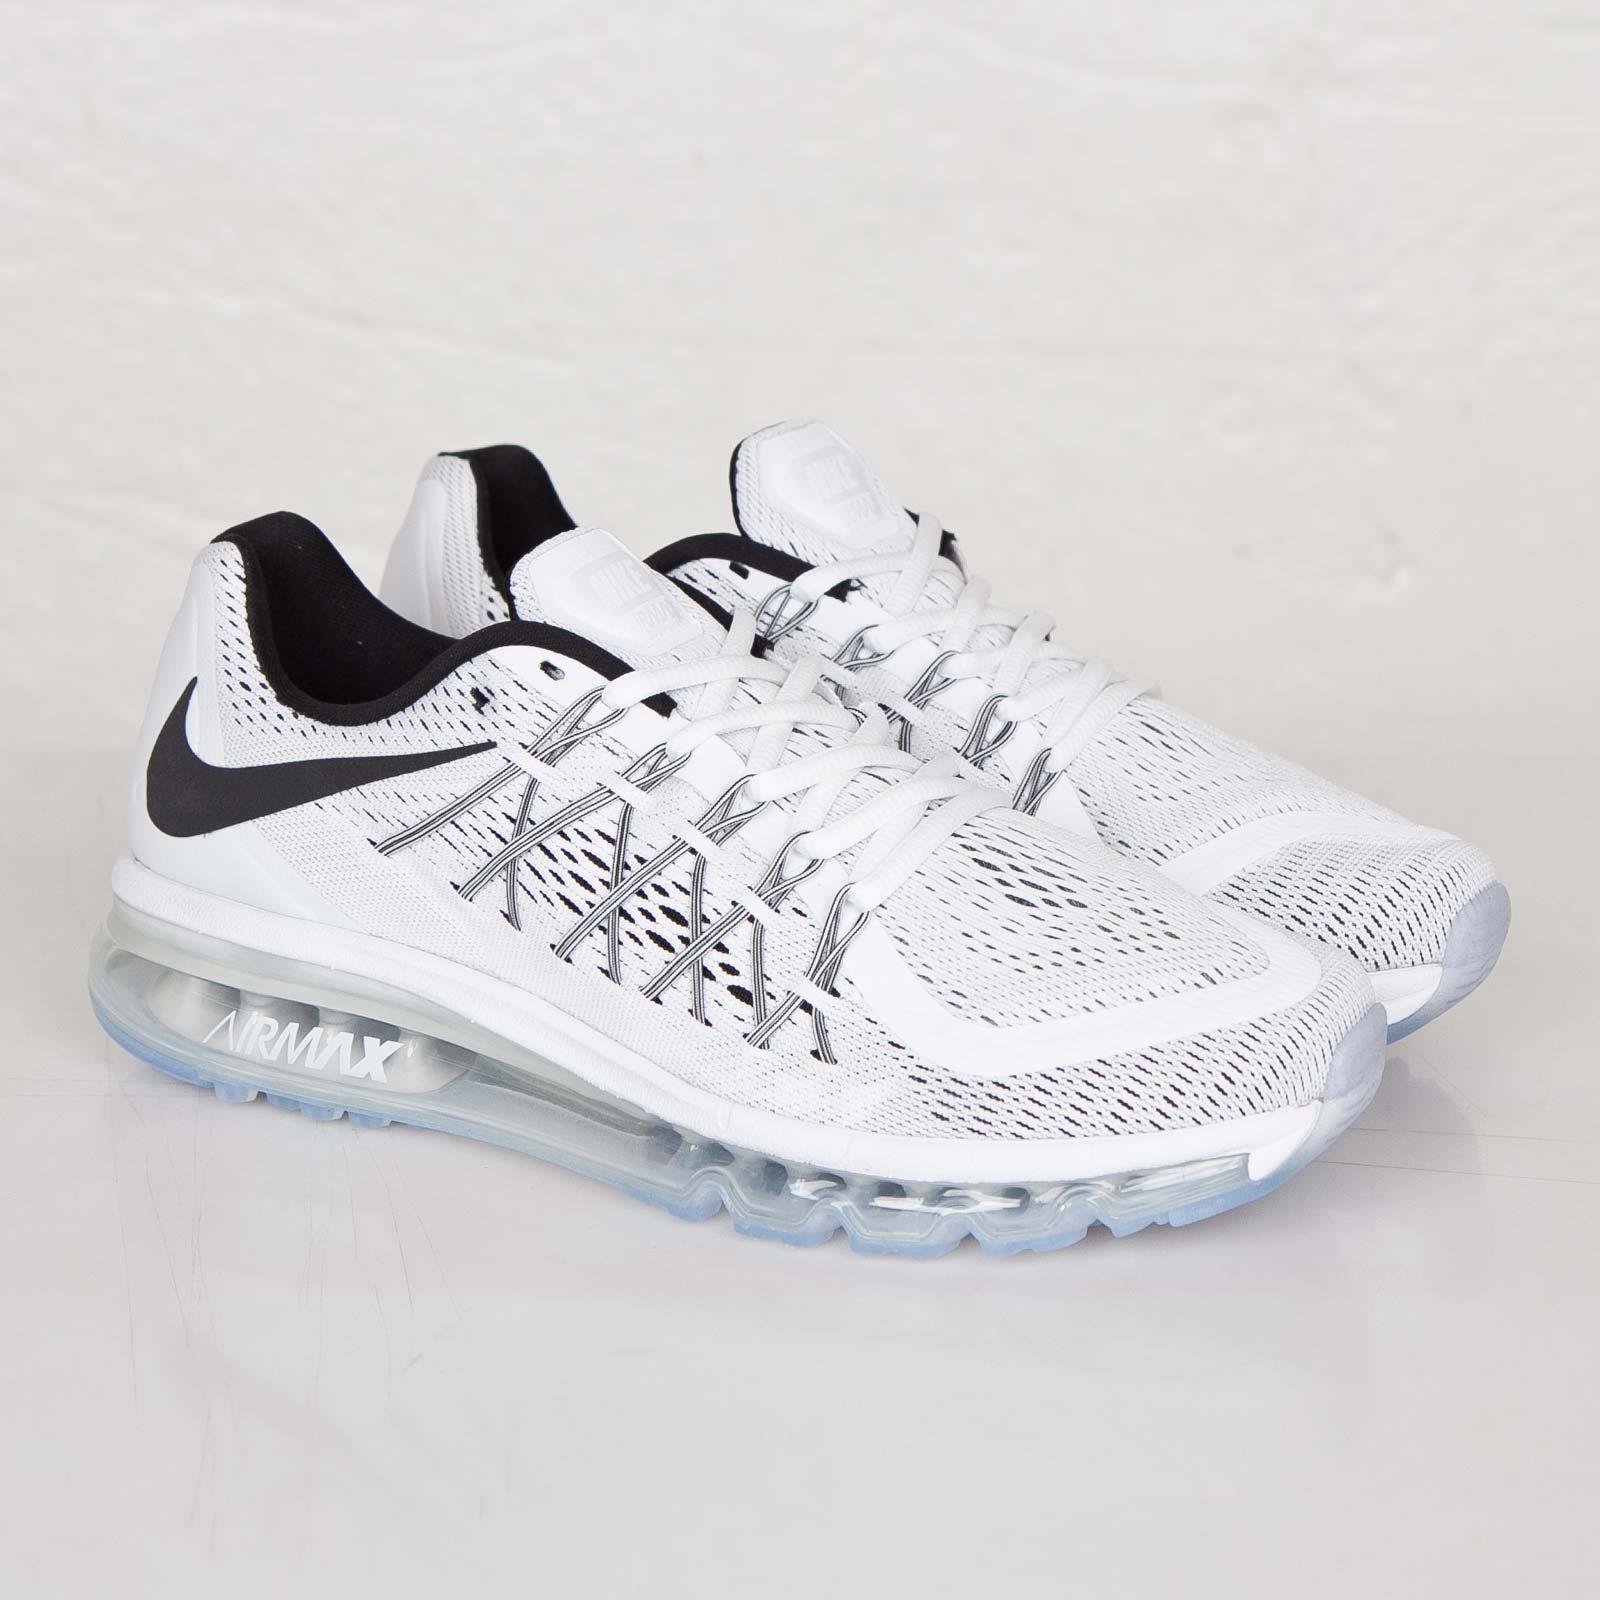 the best attitude 0c988 d4b1b Nike Air Max 2015 - 698902-101 - Sneakersnstuff | sneakers ...